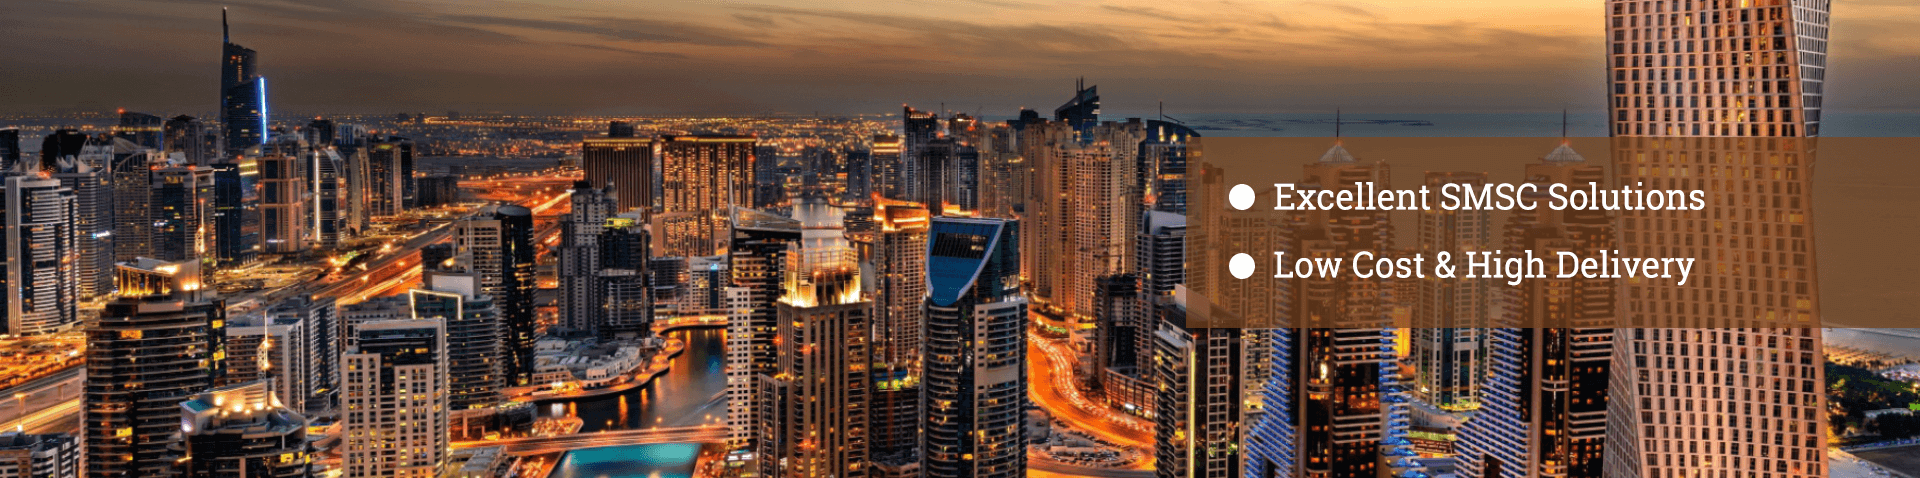 International Bulk SMS Messaging Service Provider, UAE - BroadNet